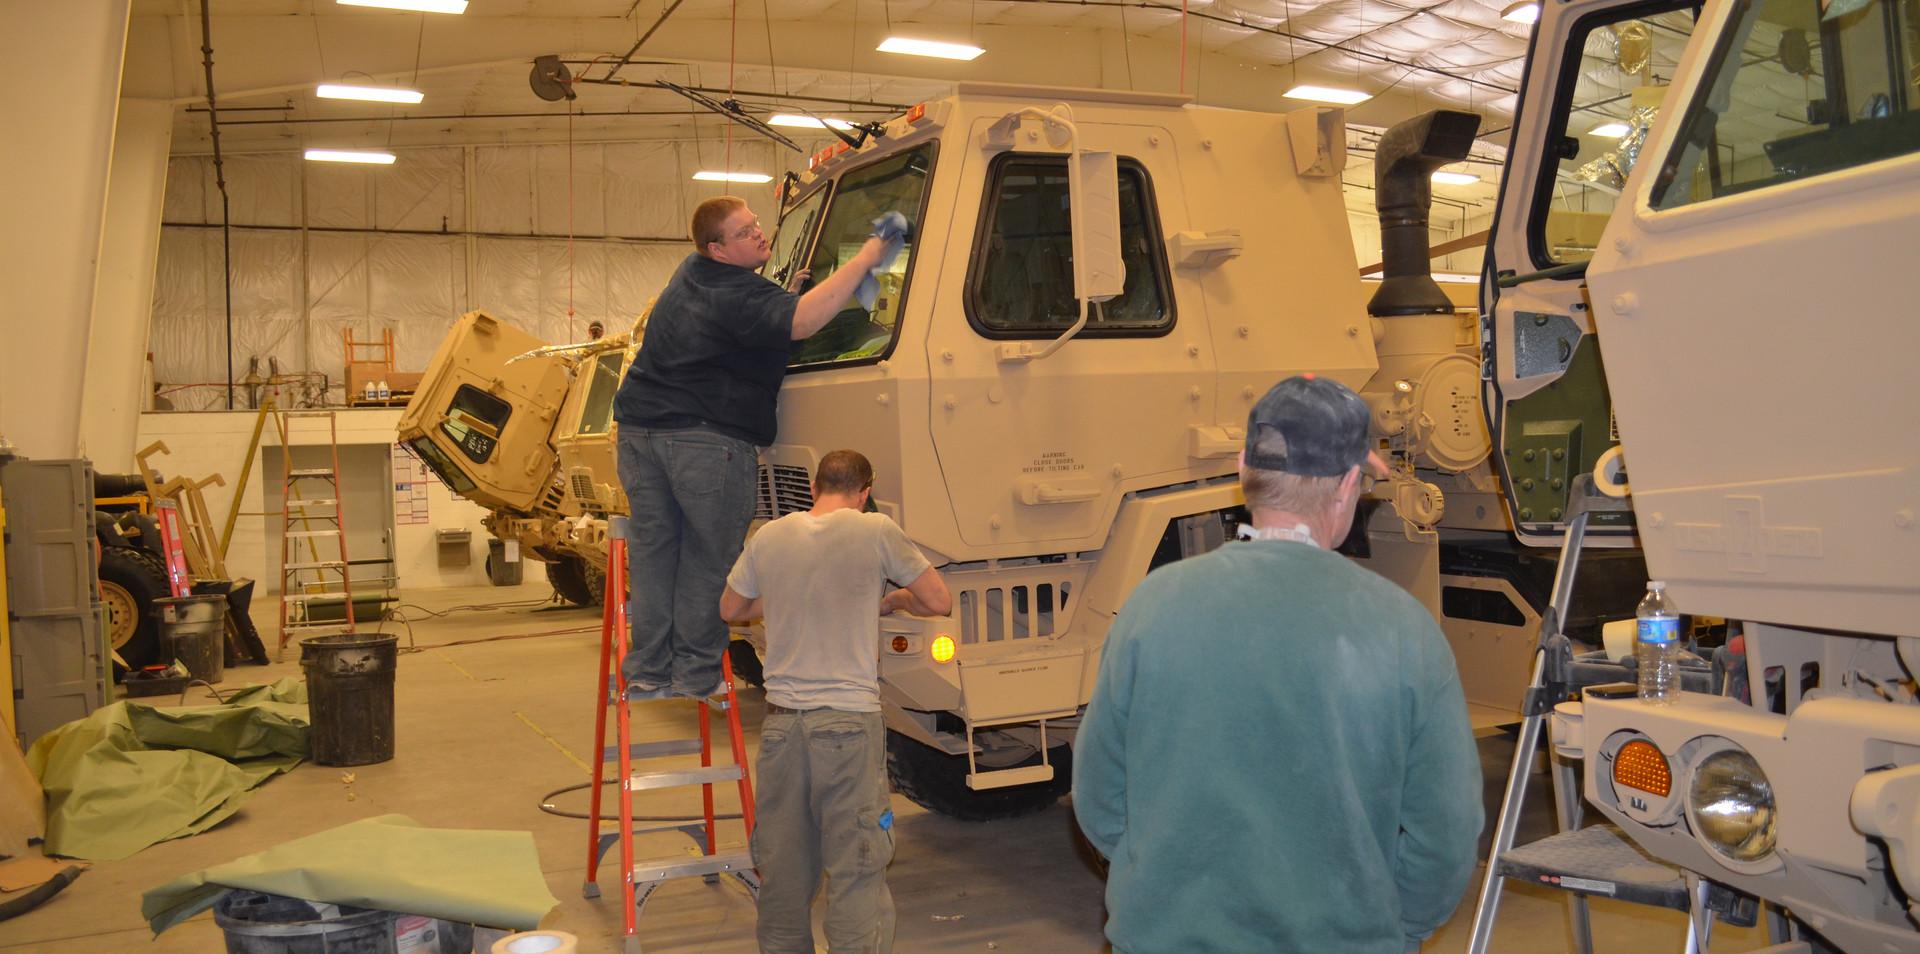 Working on FMTV military trucks